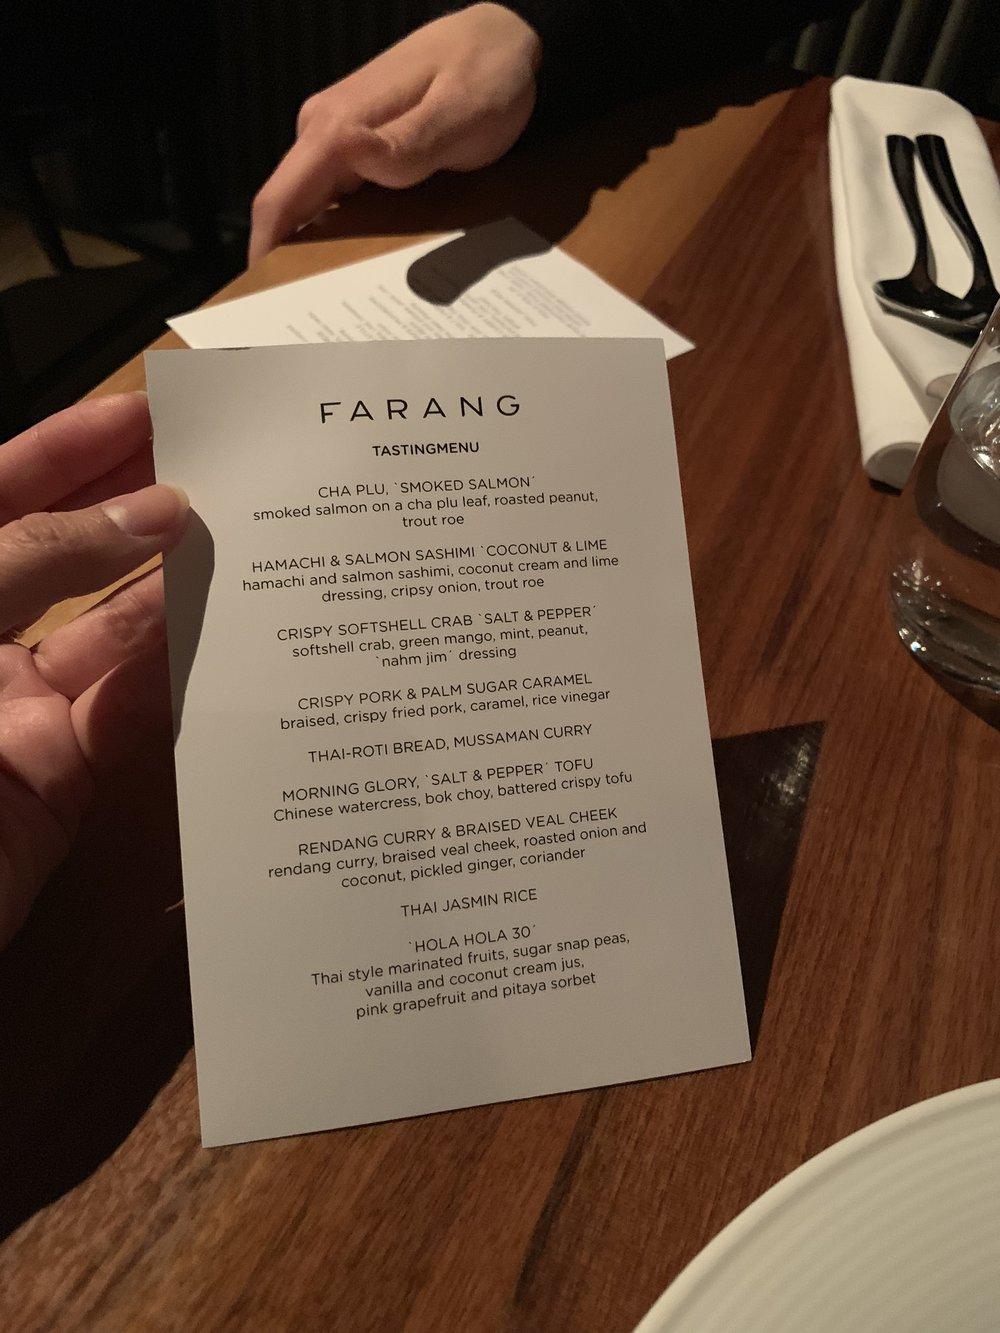 Standard Tasing Menu at Farang in Helsinki